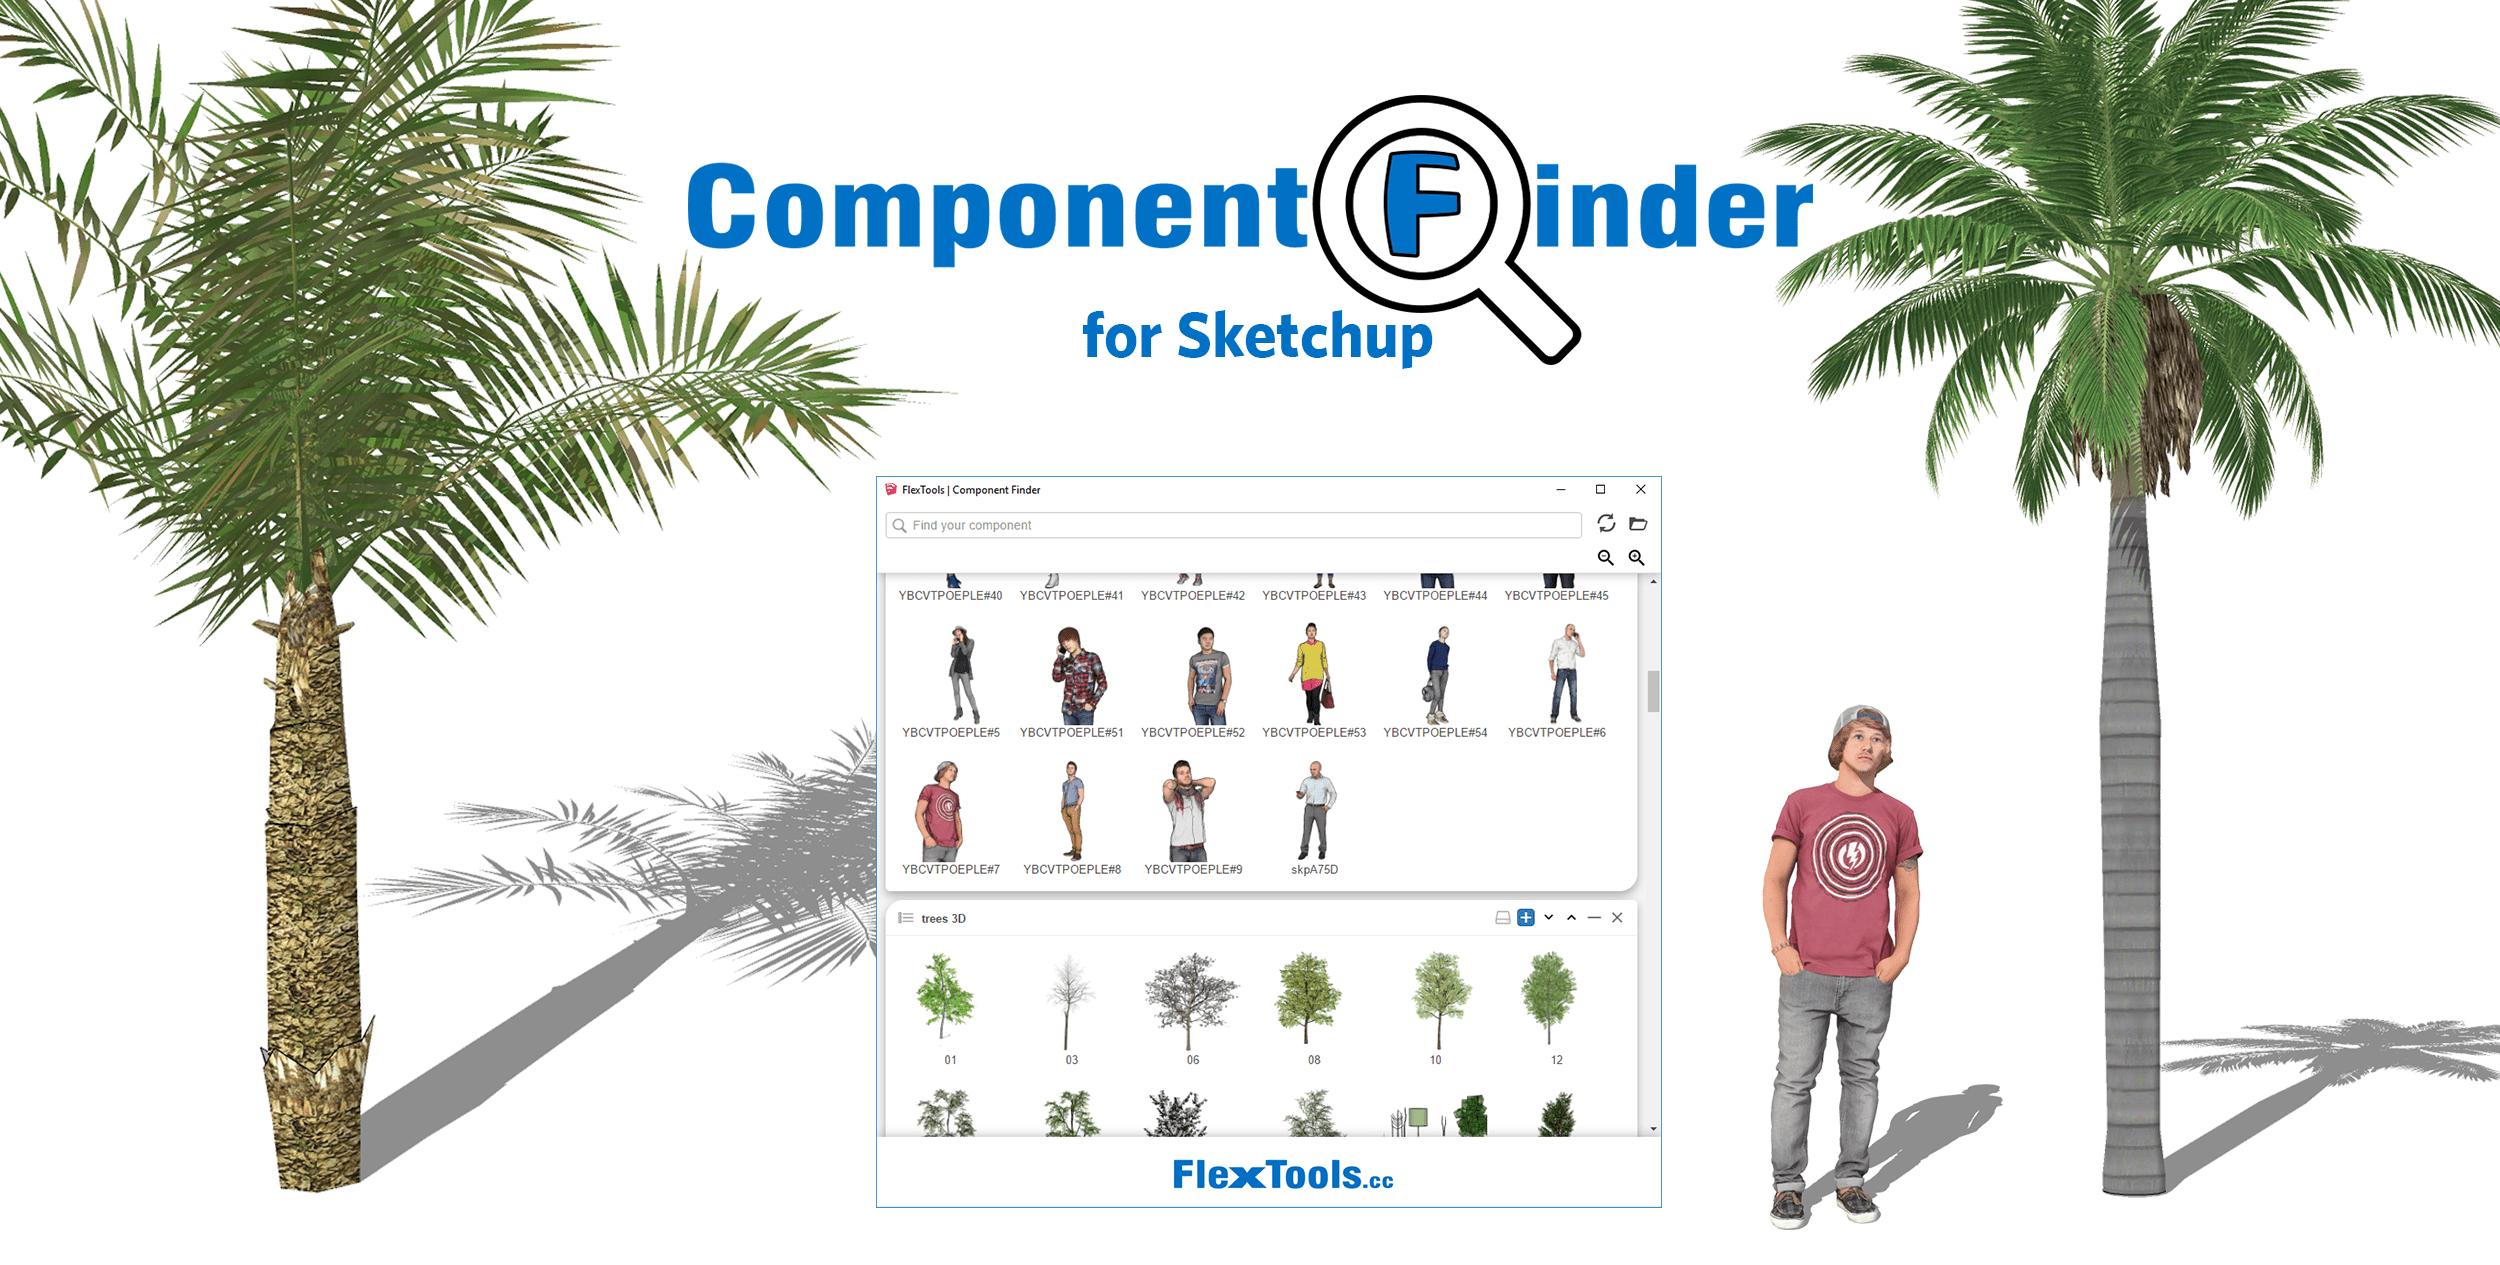 Component Finder for Sketchup Cover